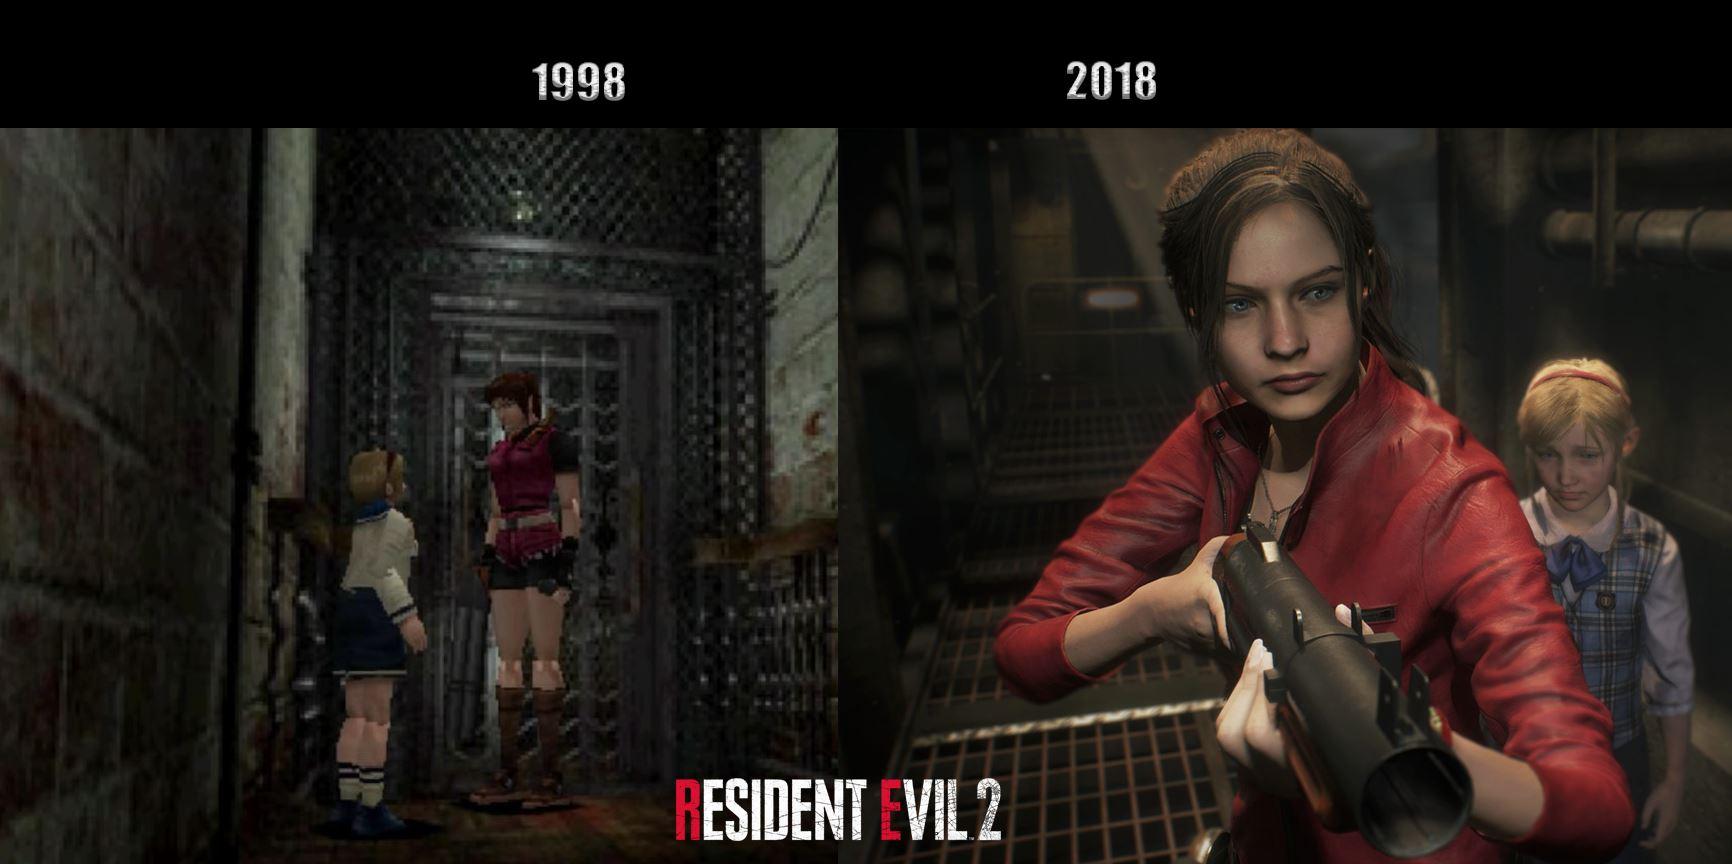 Оригинал vs Ремейк - Resident Evil 2